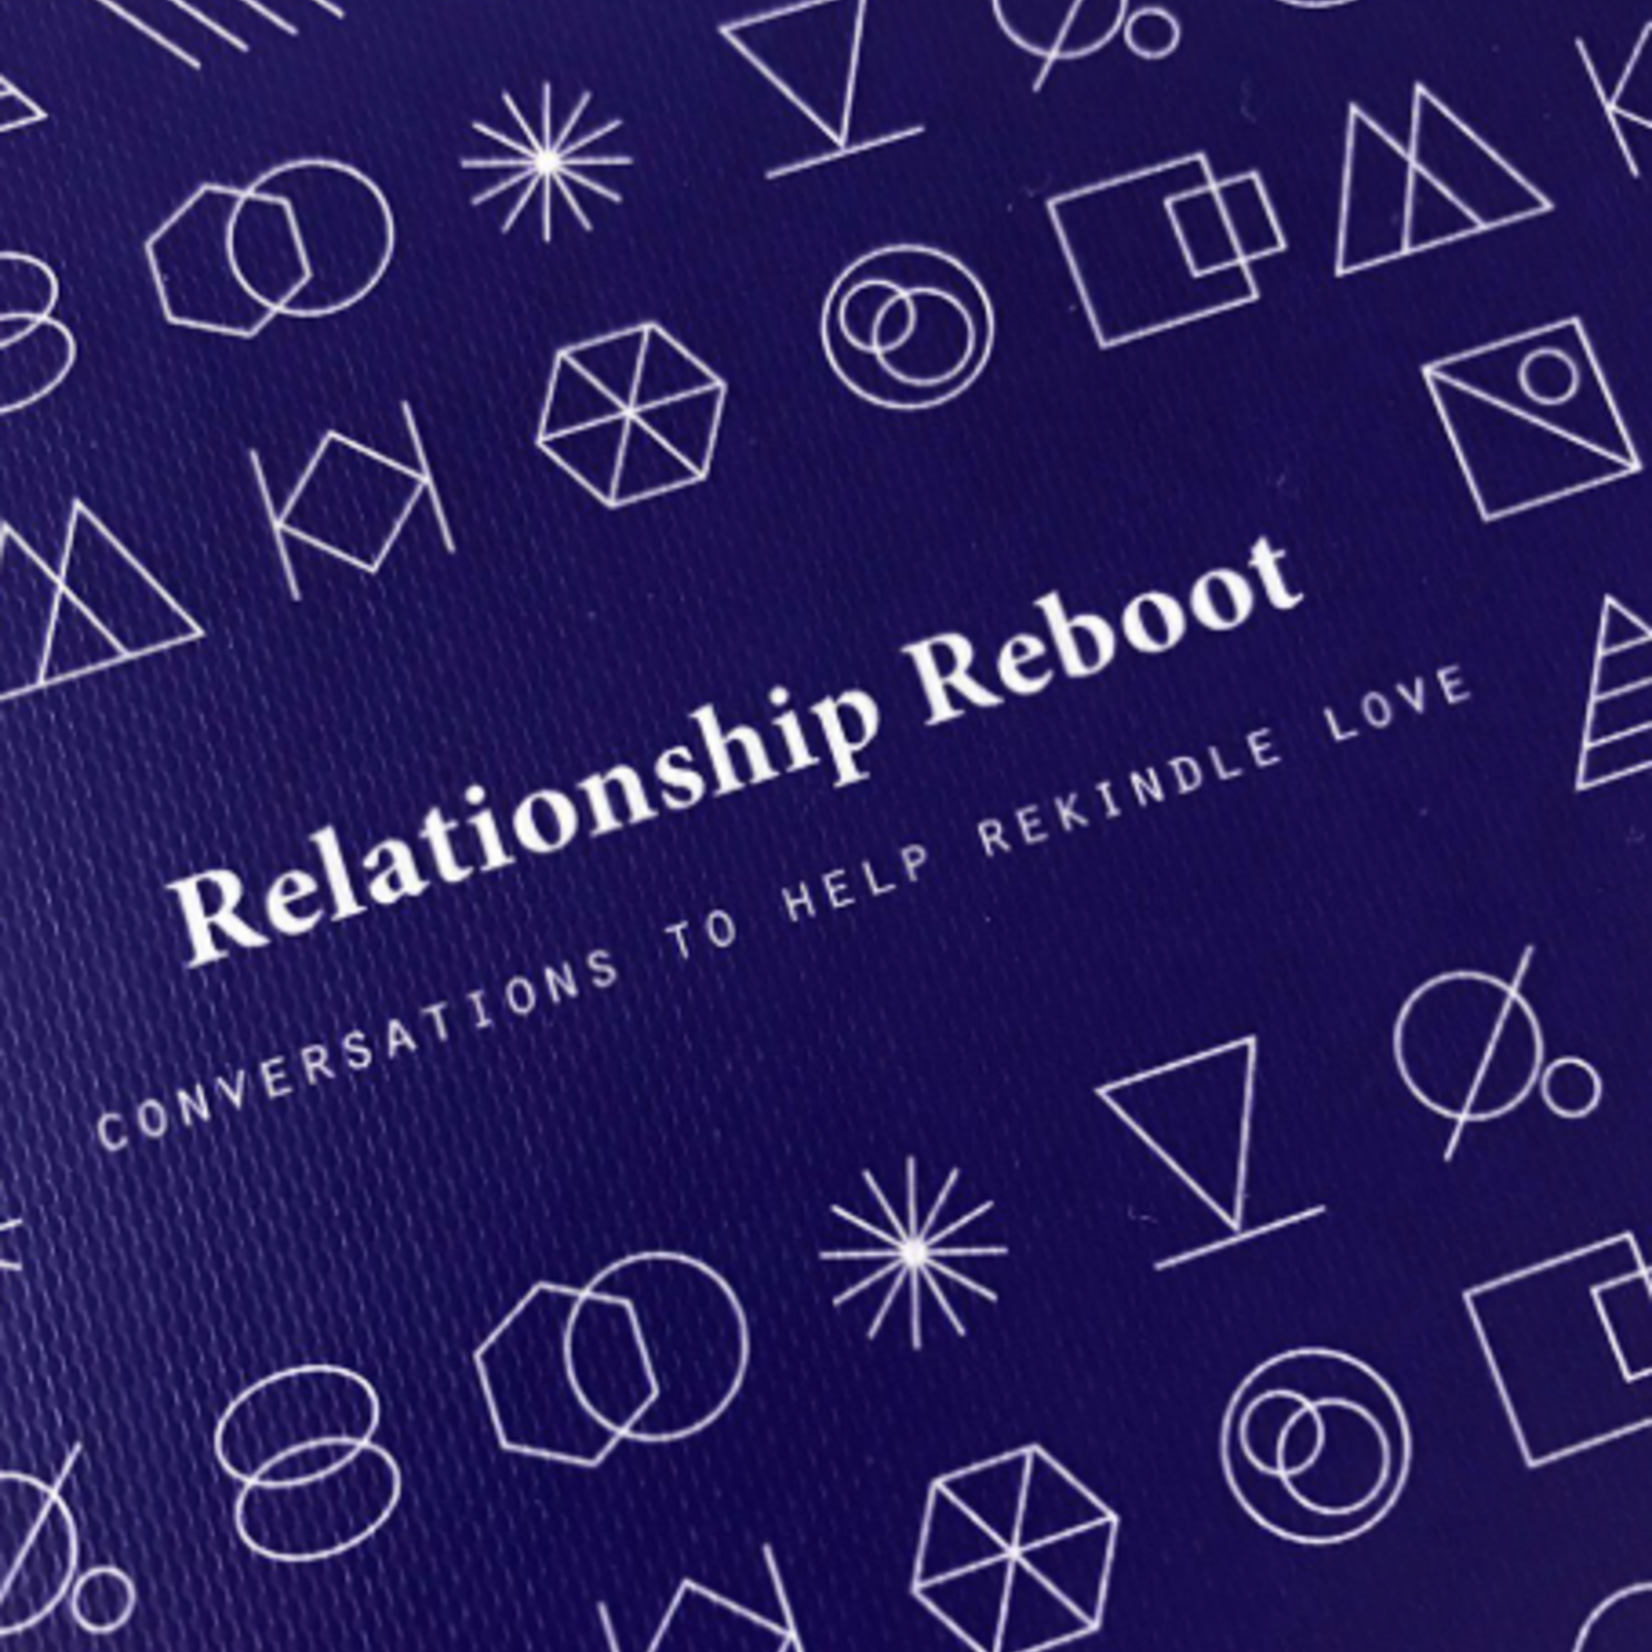 Relationship Reboot Prompt Cards